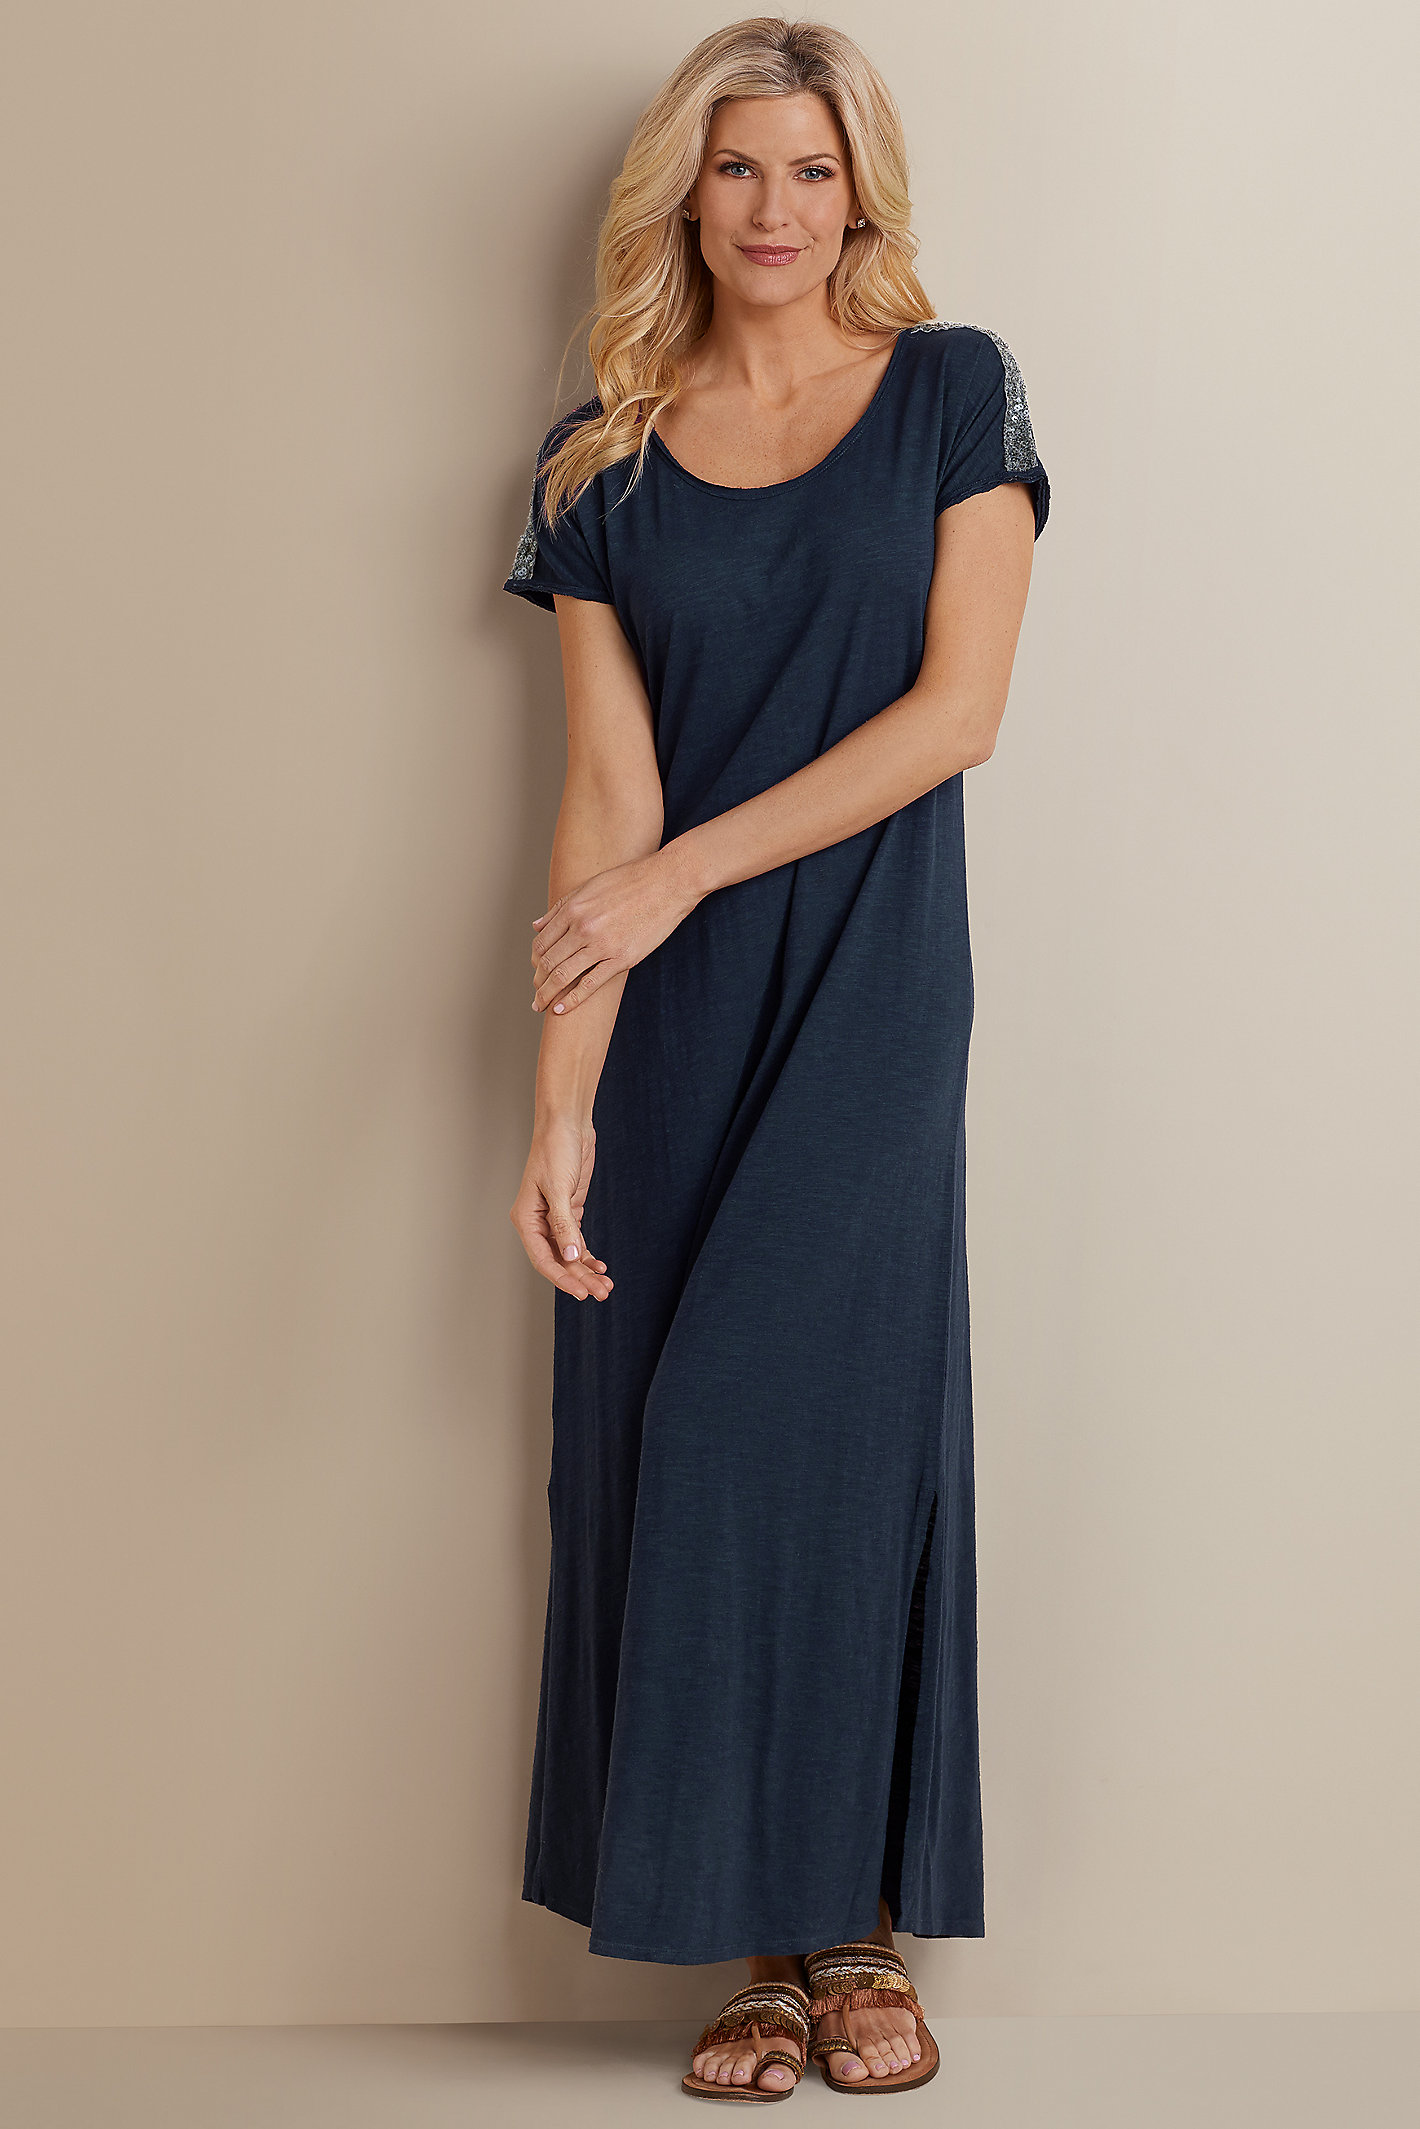 Aglow Dress